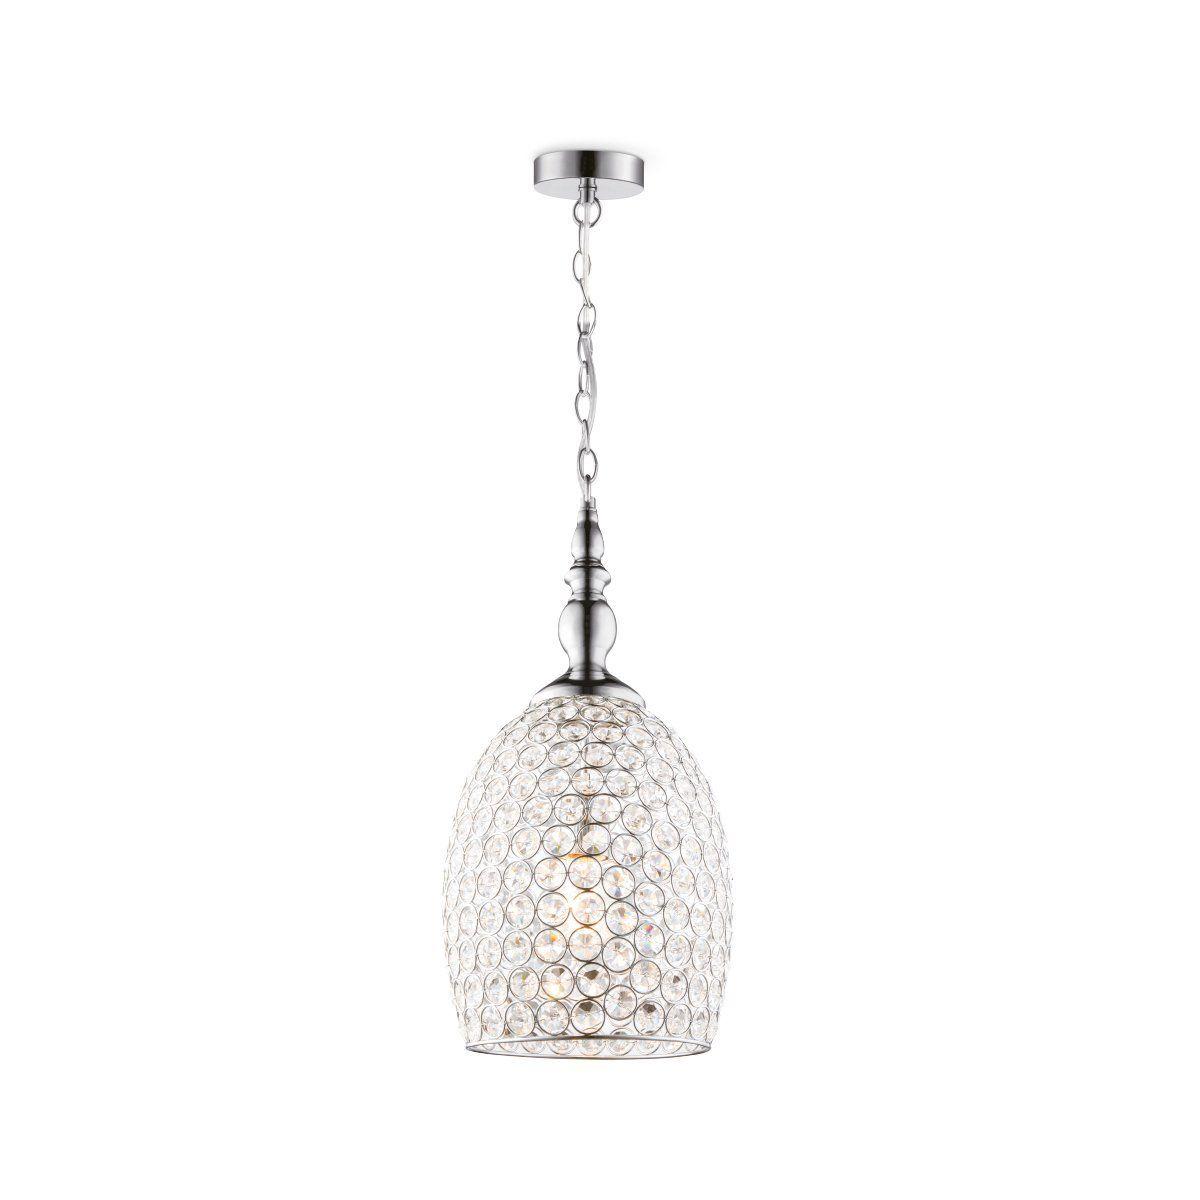 Home sweet home hanglamp Dream 24 - kristal glas